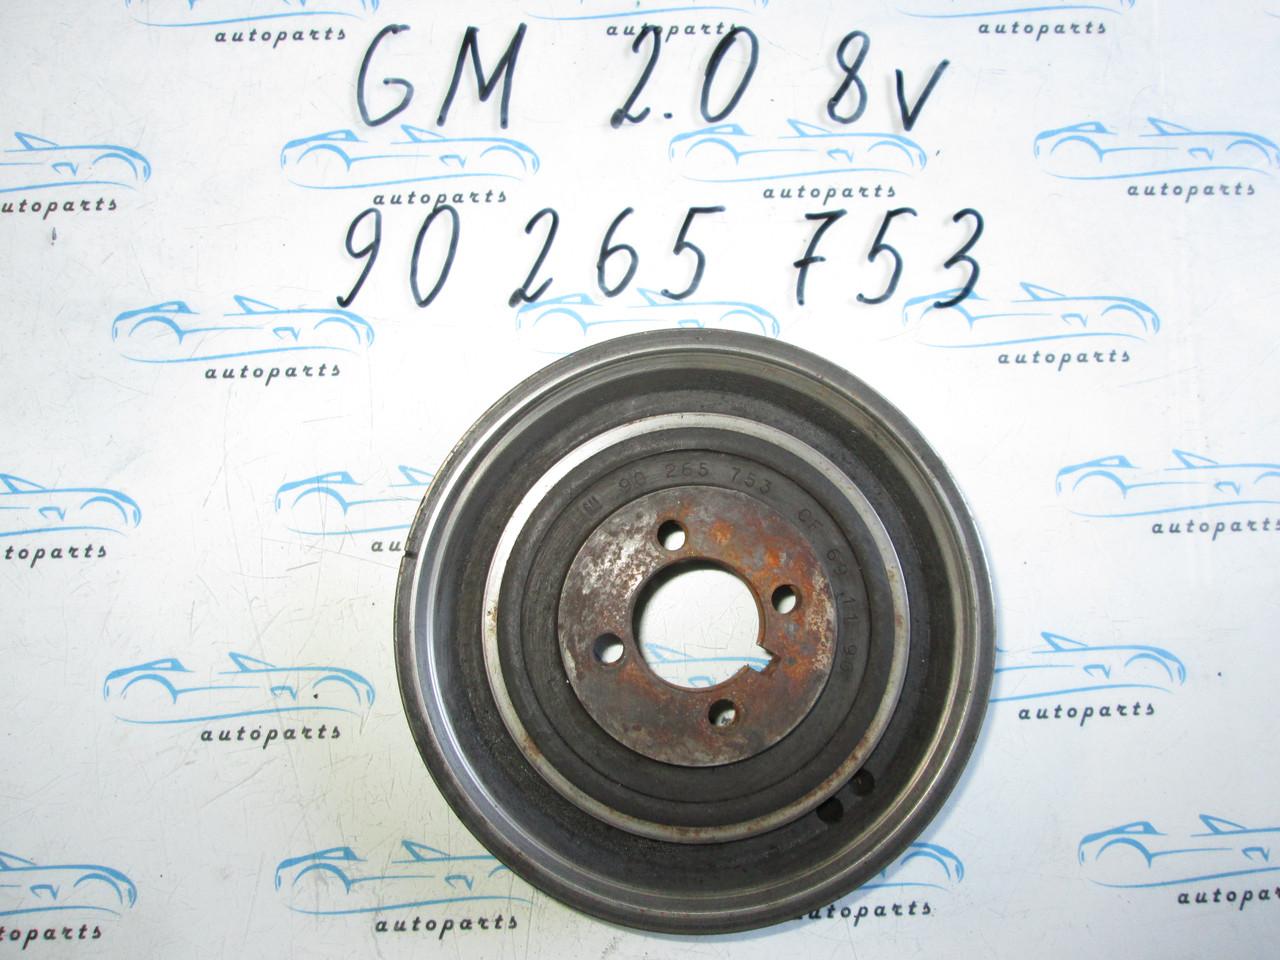 Шкив коленвала Opel 2.0 8V, 90265753